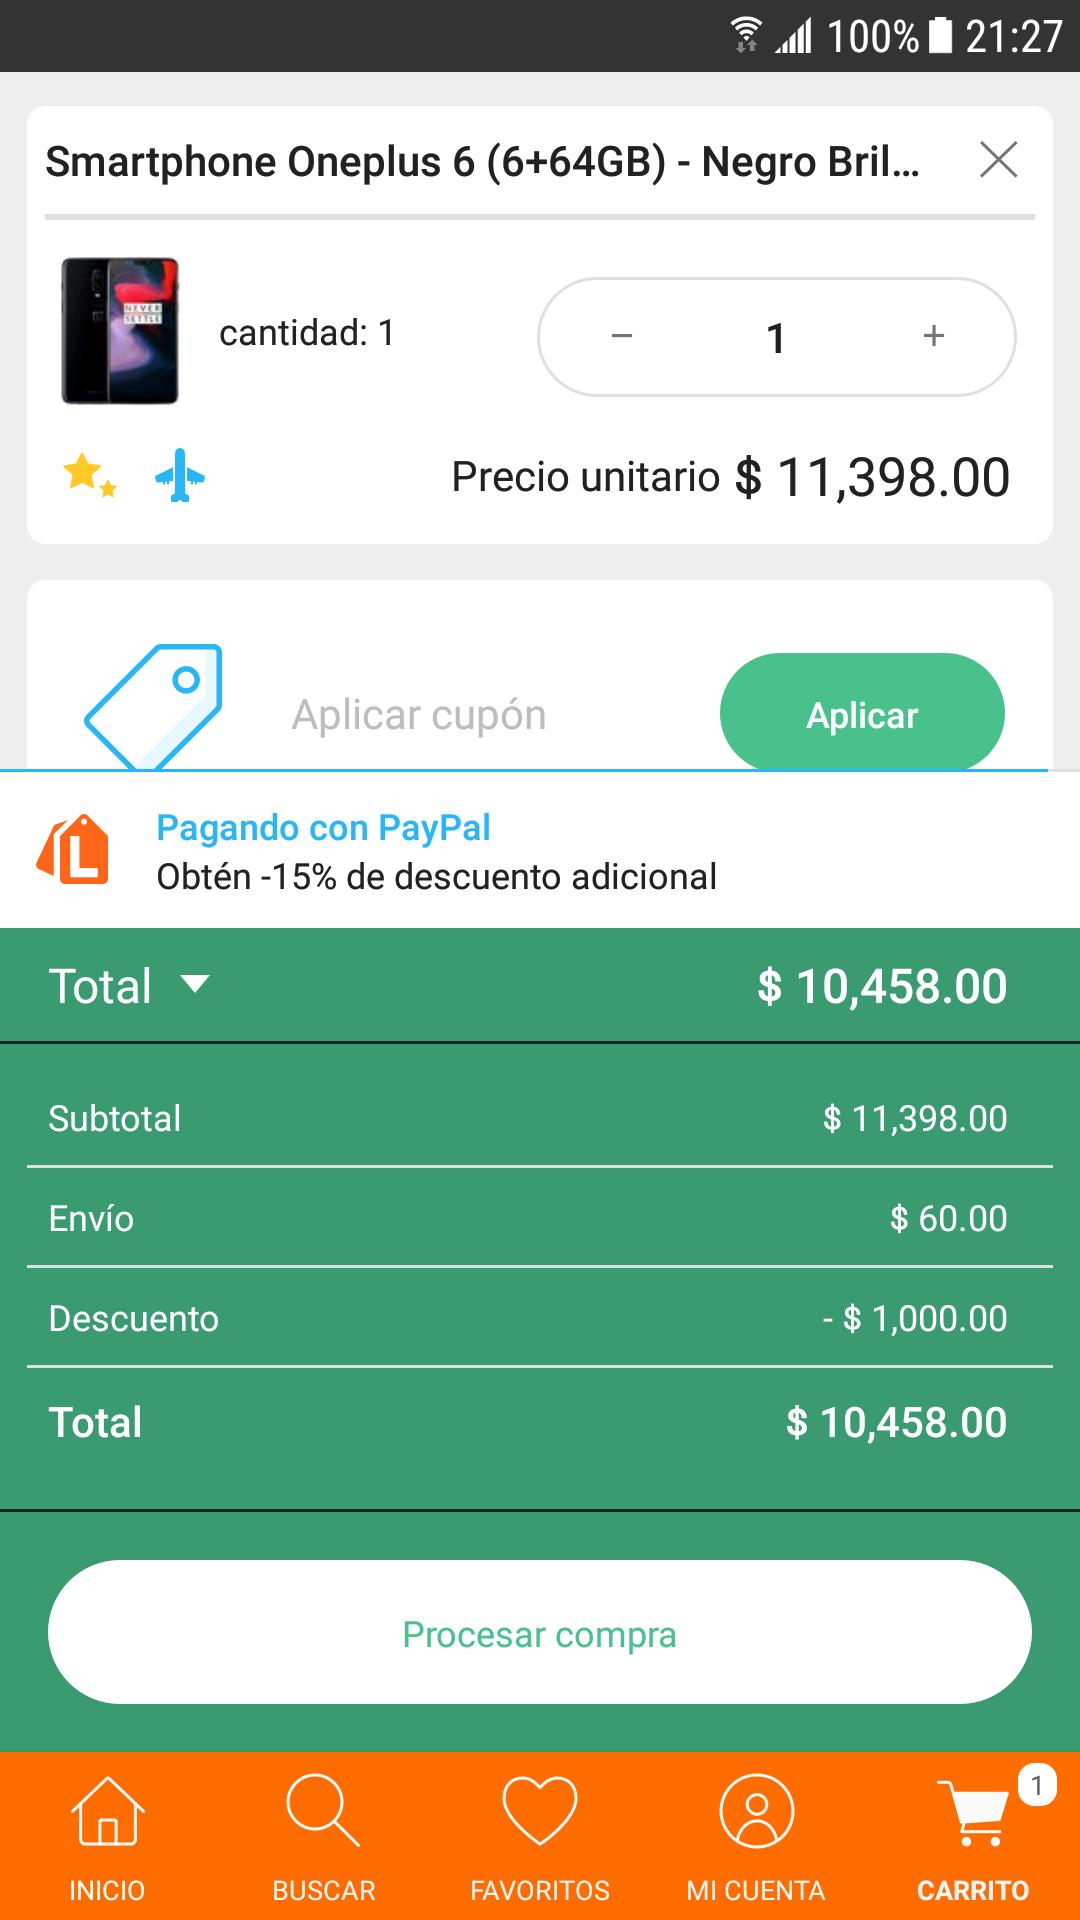 Hot Sale en Linio: OnePlus 6 6+64 Gigas con Paypal + $2,000 en cashback